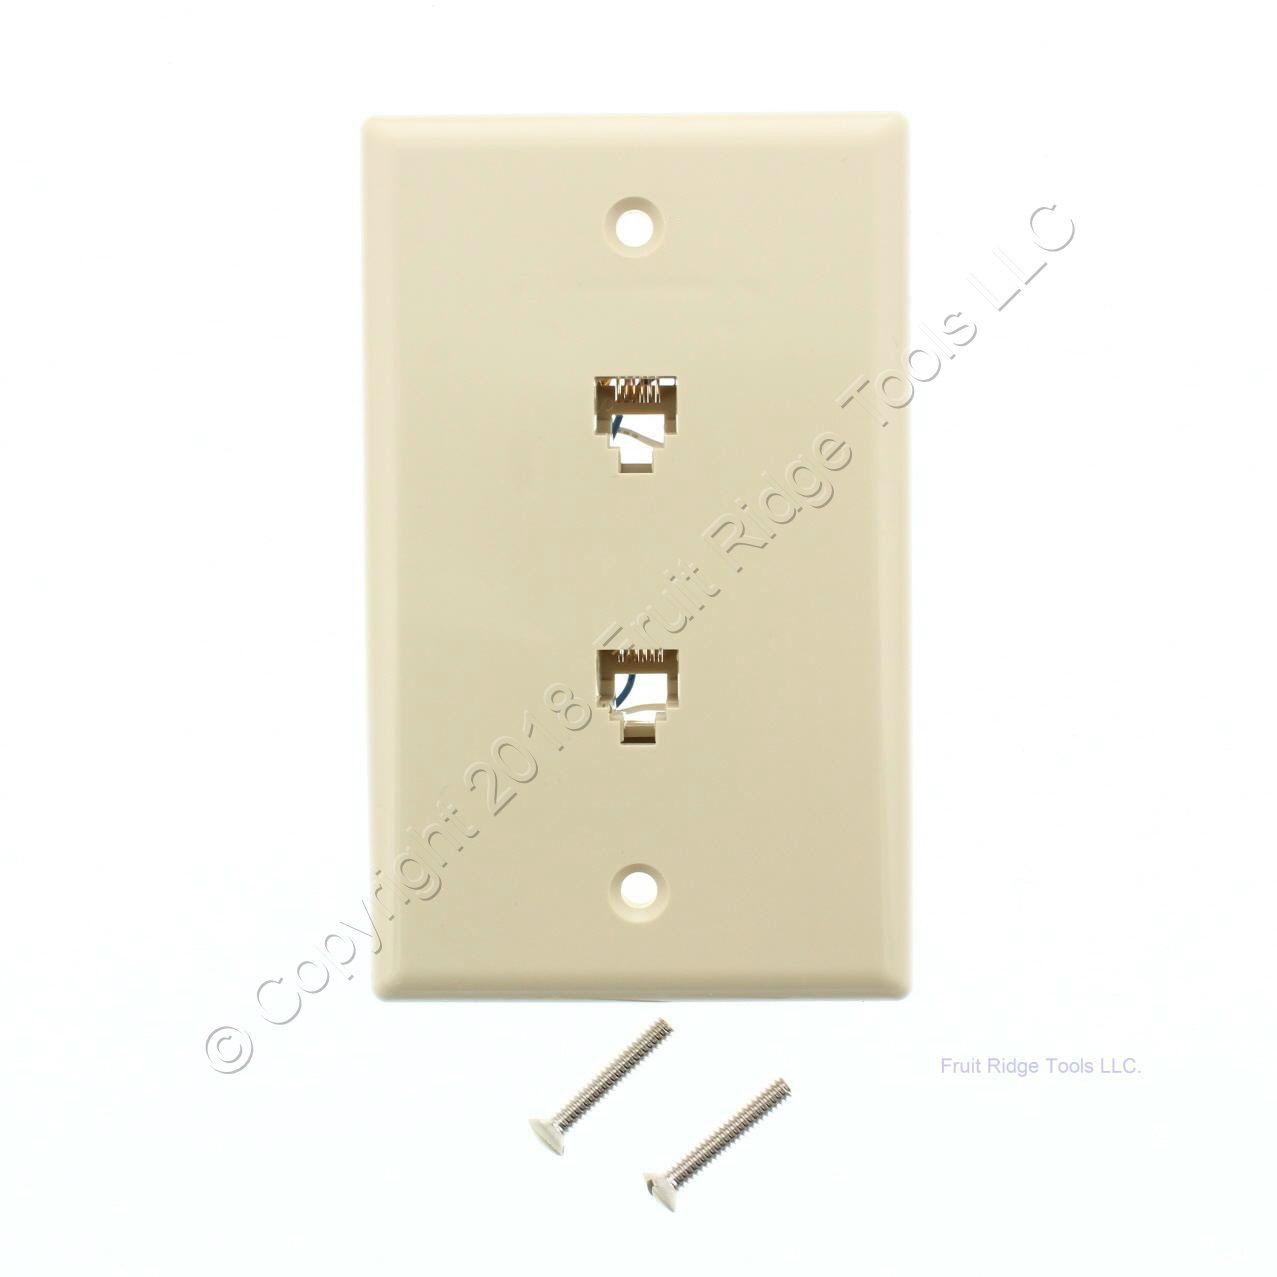 10 leviton ivory dual phone jack flush wallplates 6 wire. Black Bedroom Furniture Sets. Home Design Ideas